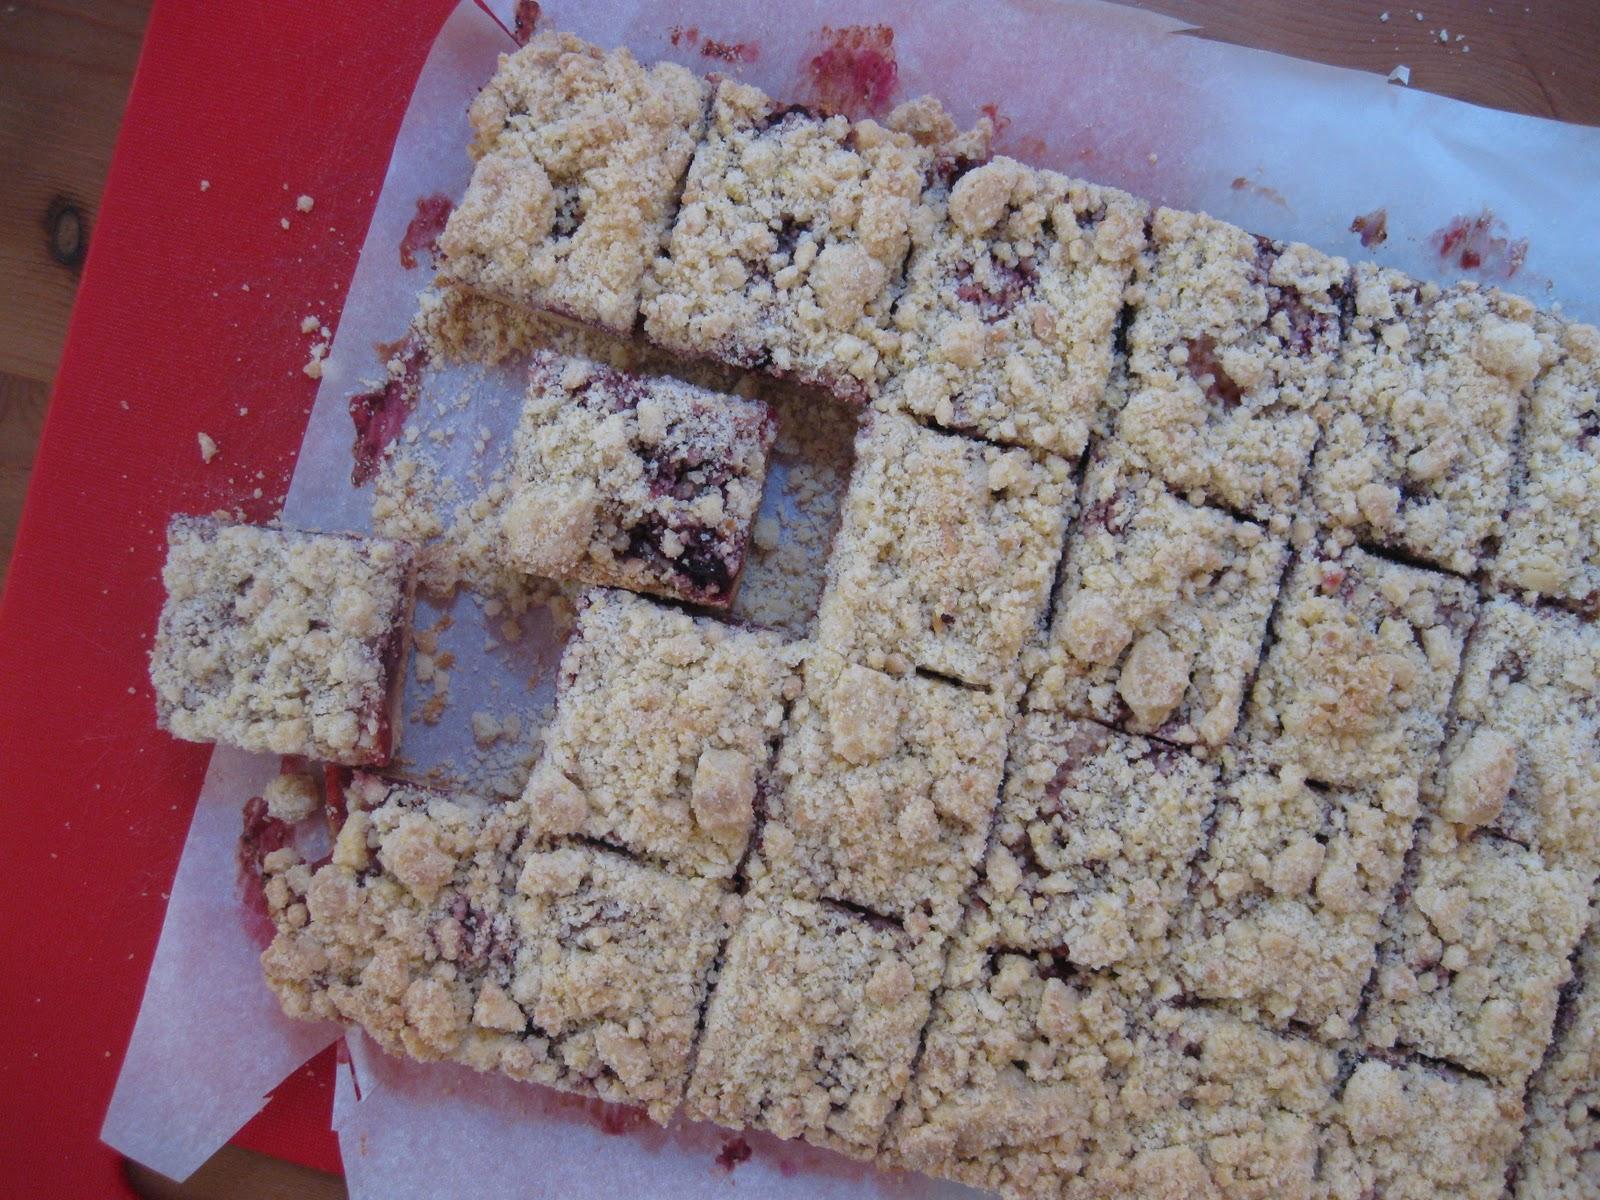 Sunday Treats: Berry Cornmeal Crumble Bars